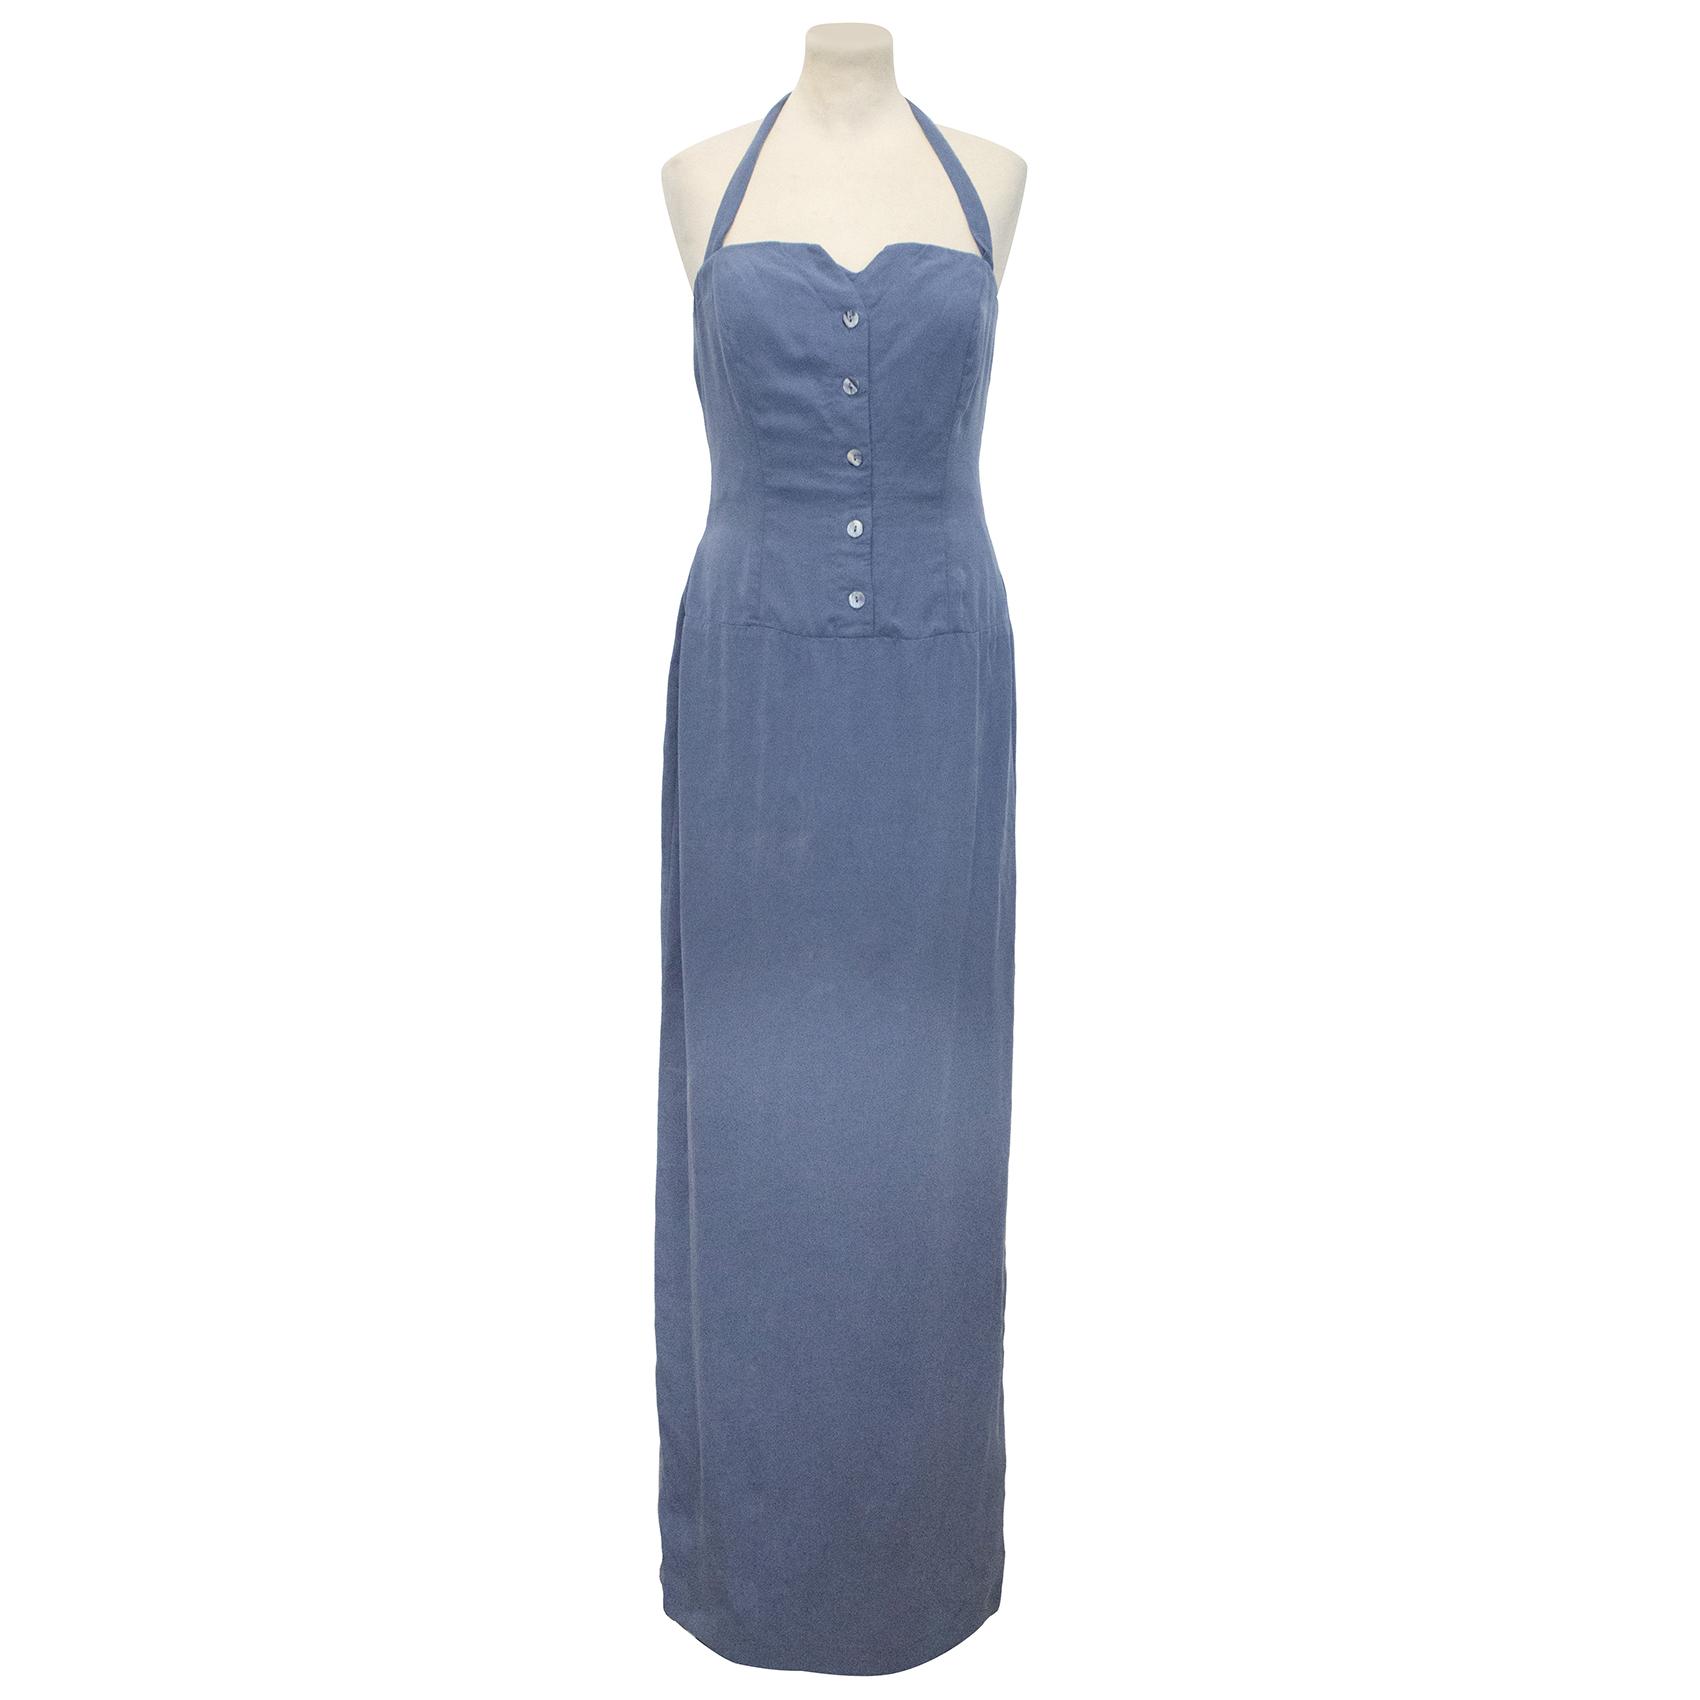 Adam by Adam Lippes Blue Tencel Long Dress